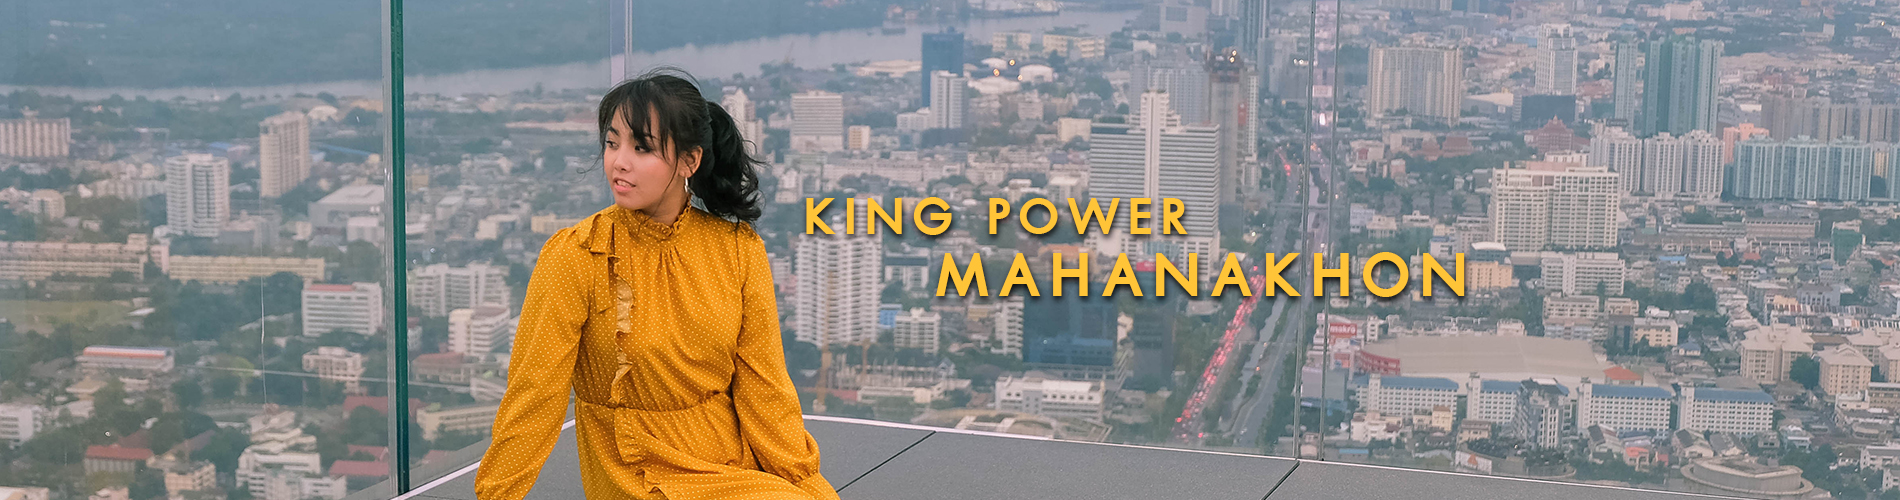 KING POWER MAHANAKHON